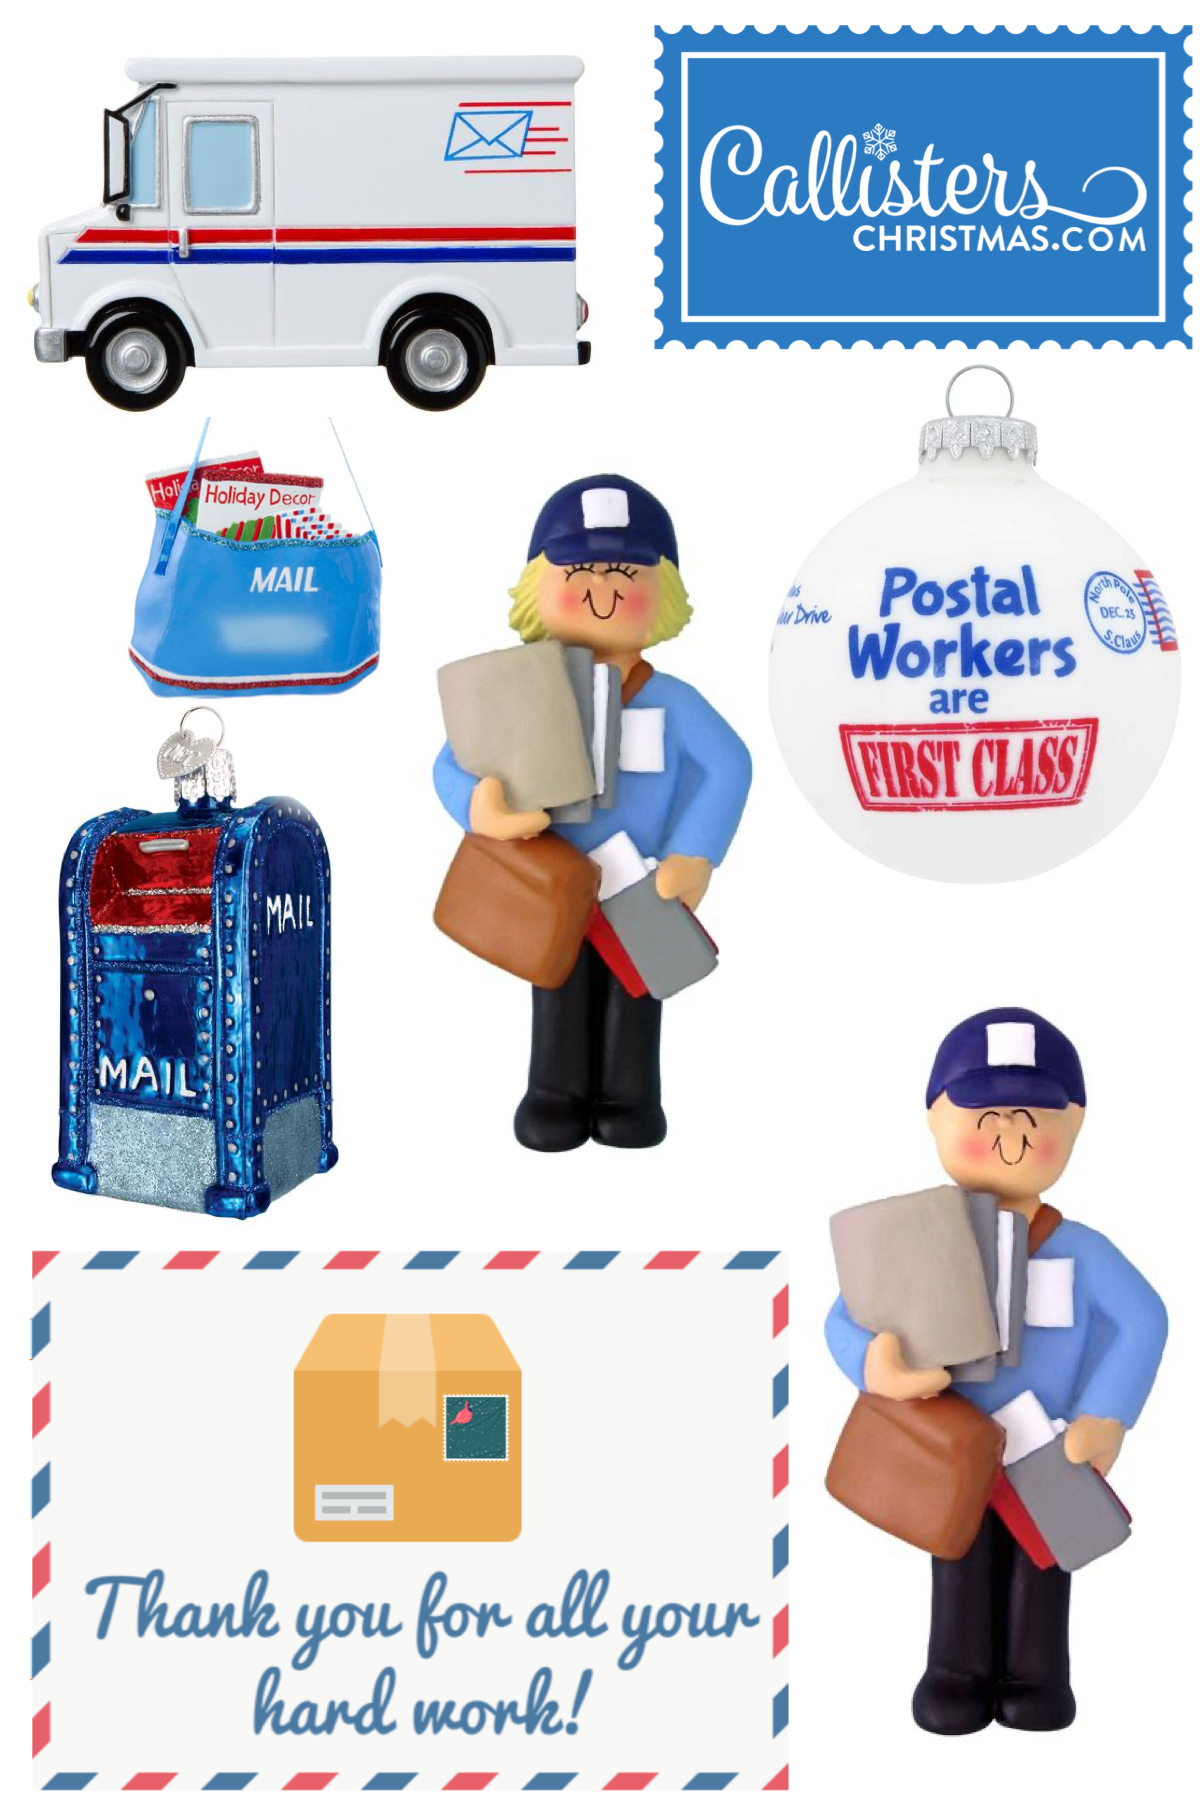 Job Occupation Ornaments Postal Workers Callisters Christmas Postal Worker Old World Christmas Ornaments Old World Christmas